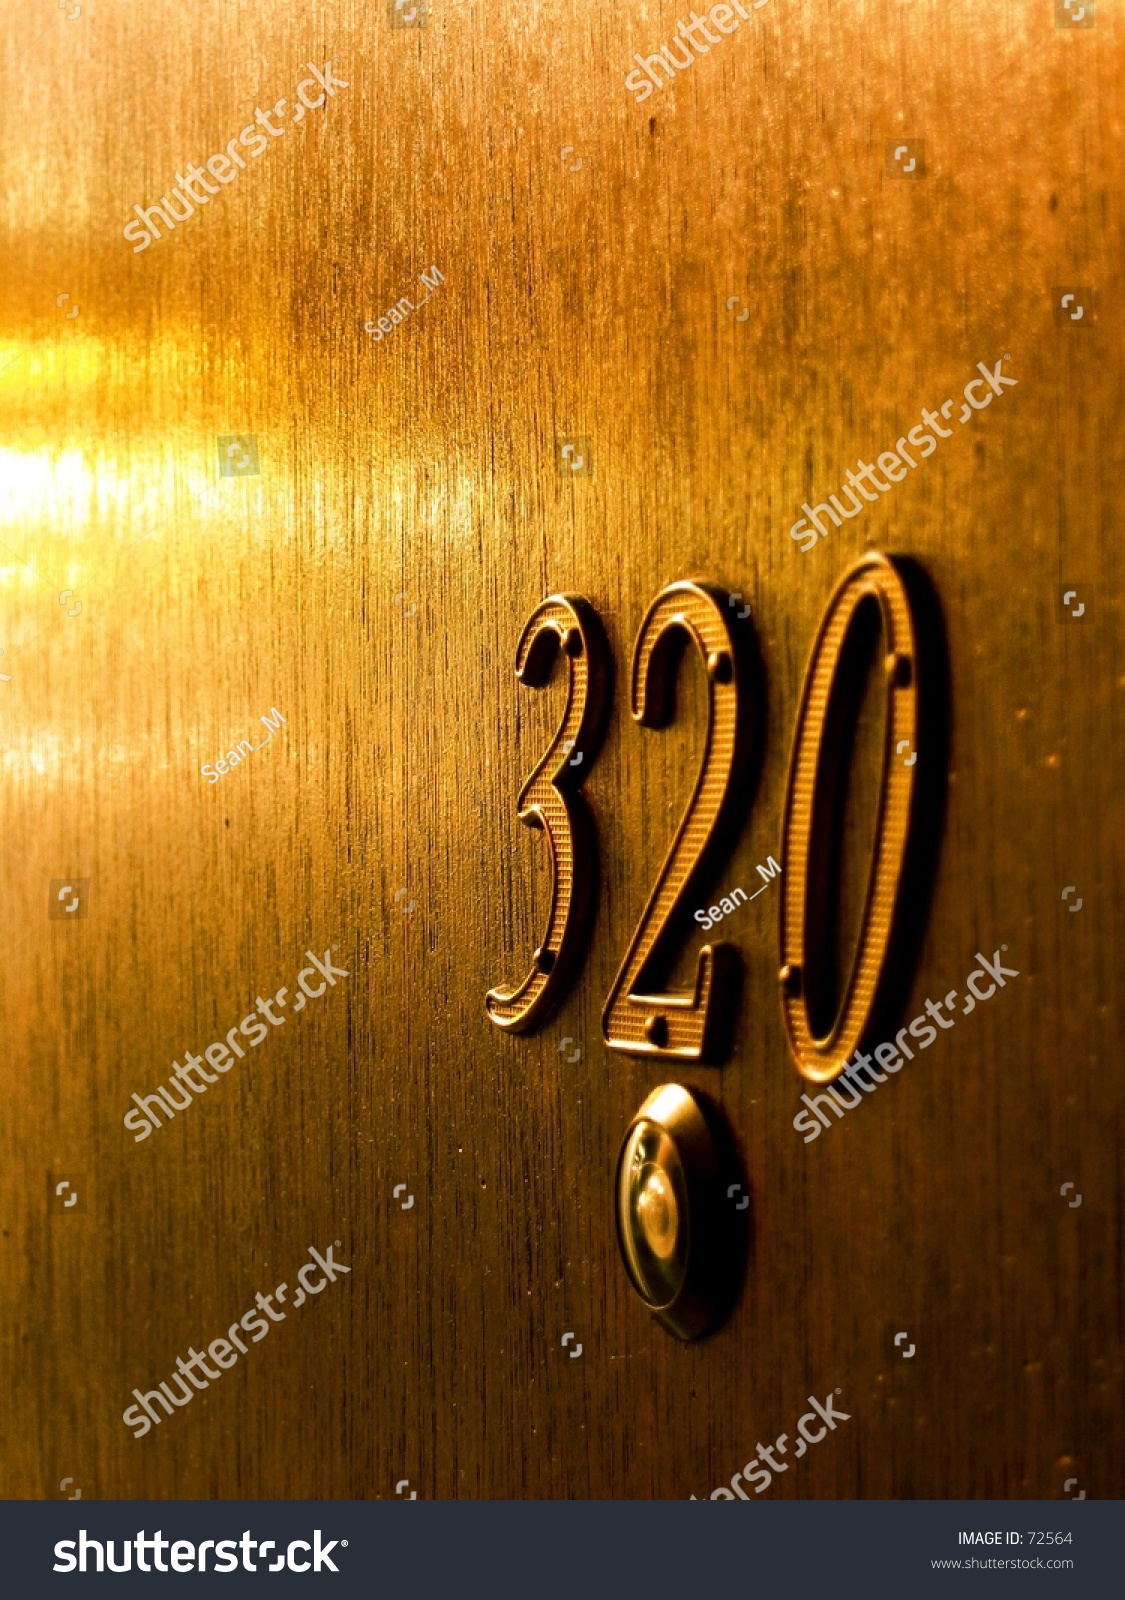 Apartment Door With The Number 320. Stock Photo 72564 : Shutterstock